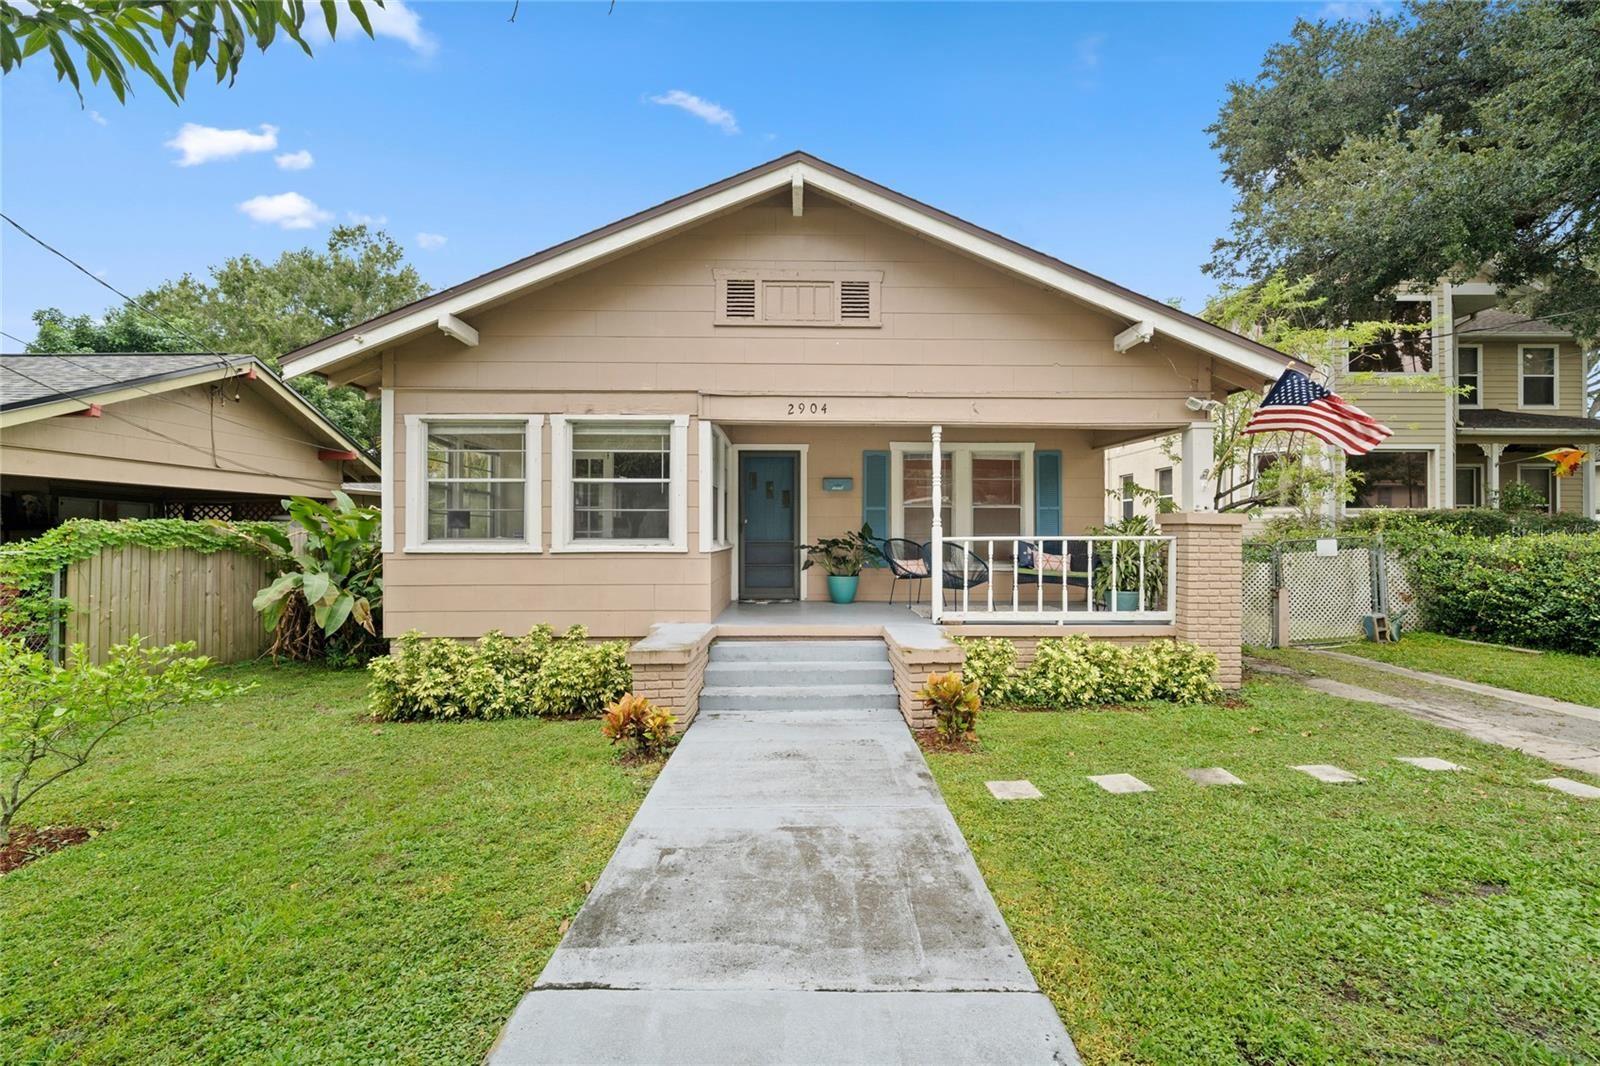 2904 N DECATUR AVENUE, Tampa, FL 33602 - #: T3325486